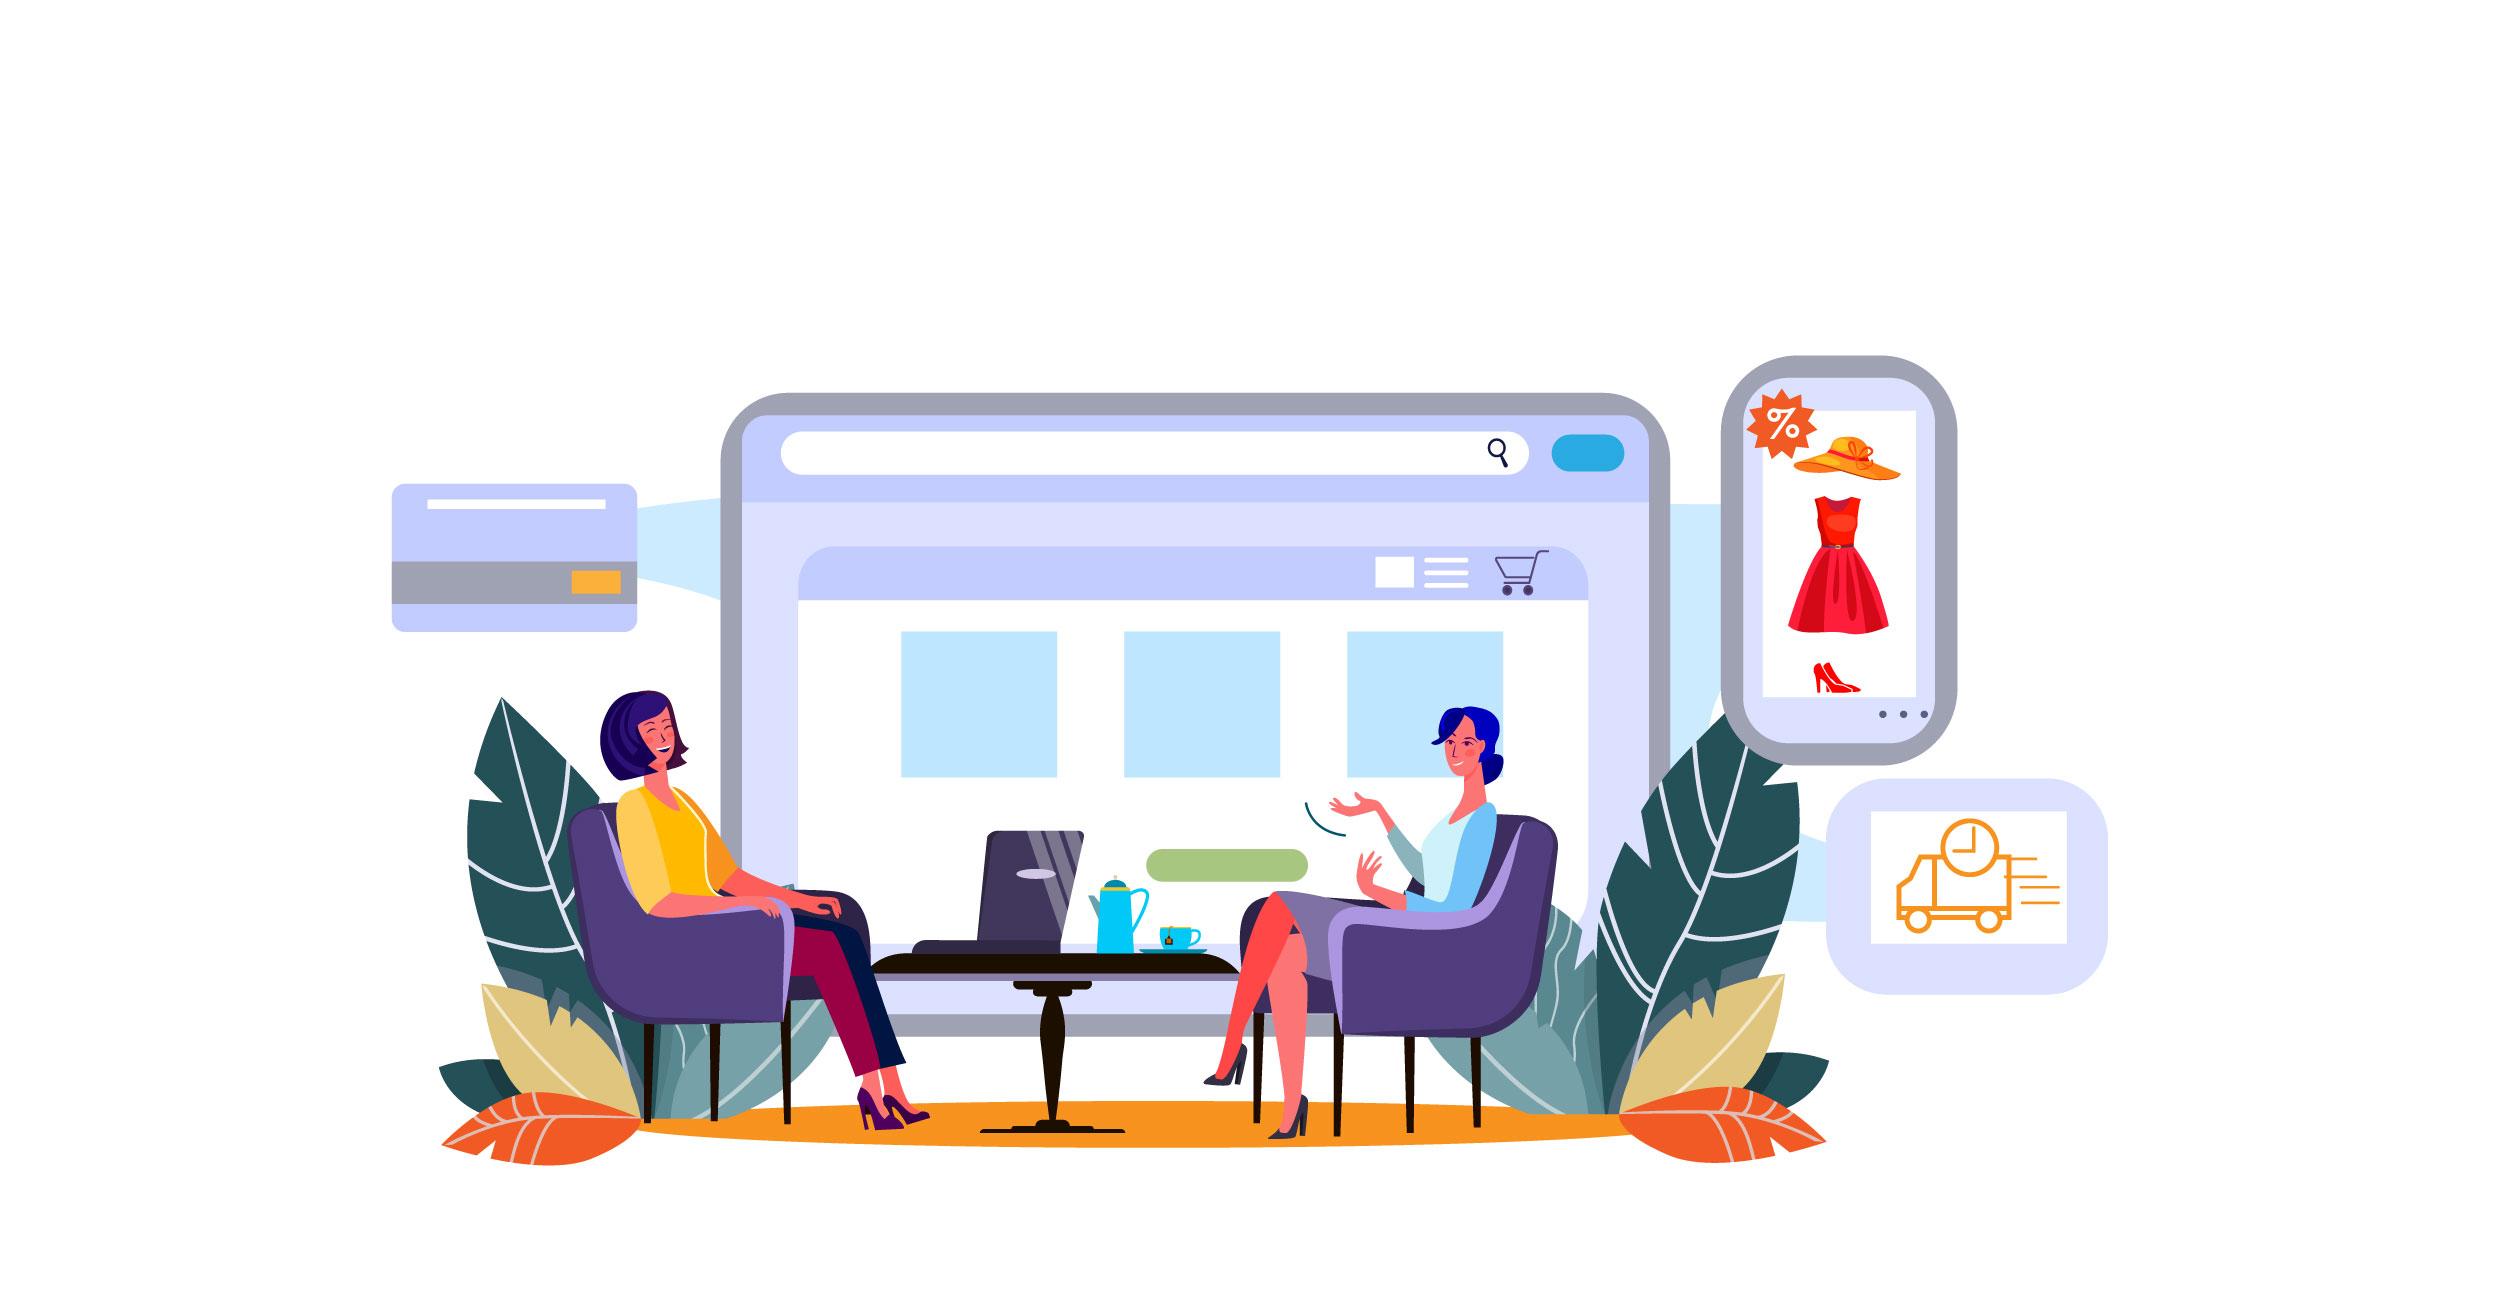 5 maneras efectivas de conquistar a tus clientes online